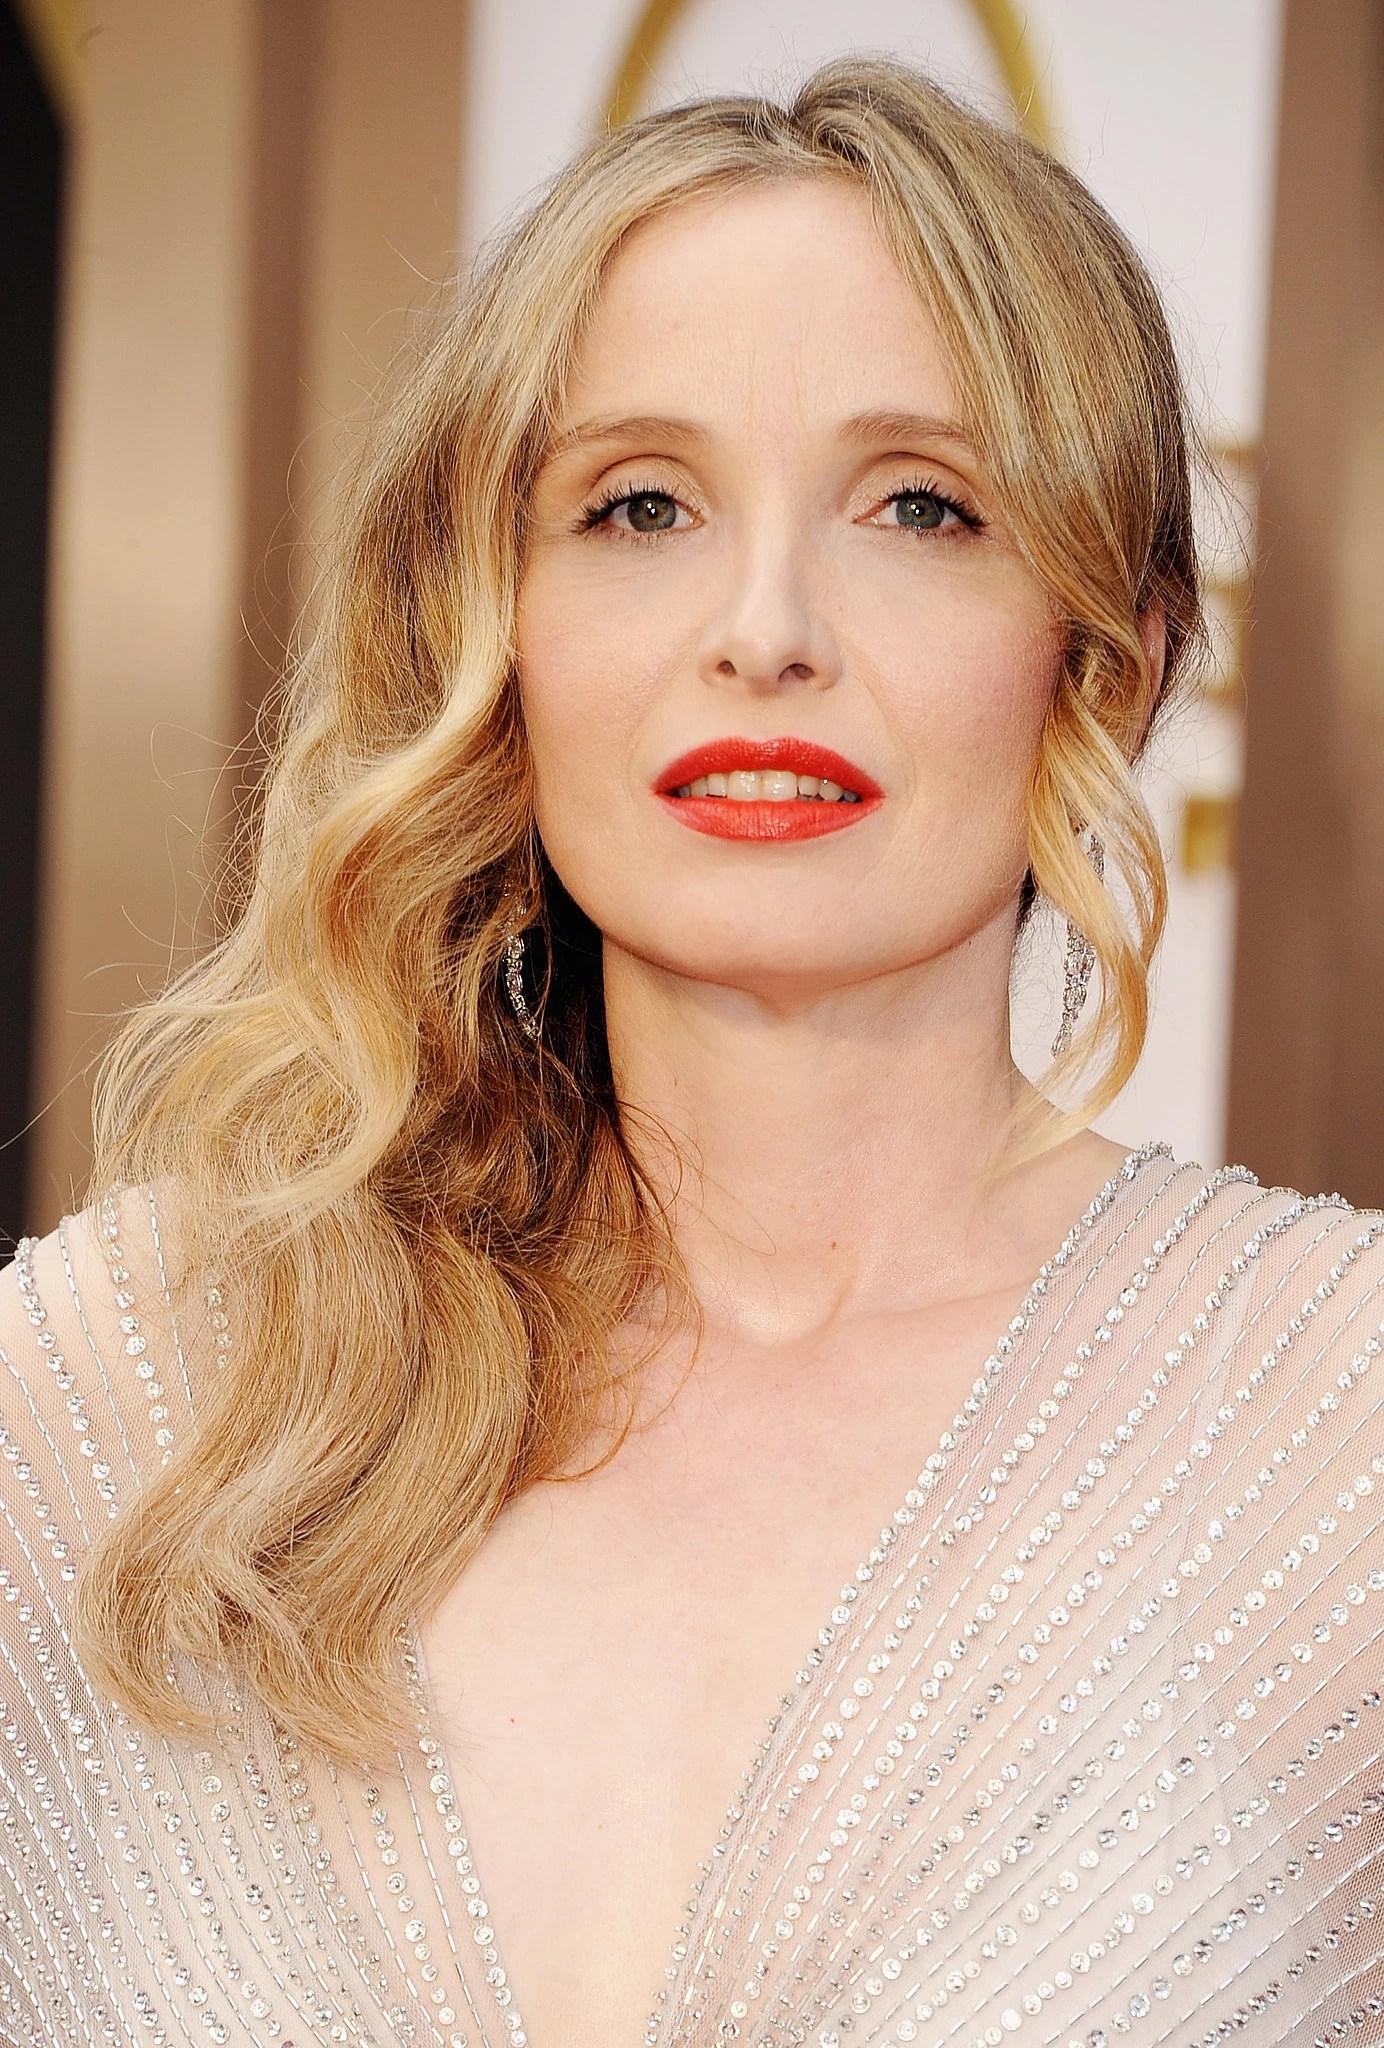 Julie Delpy Marvel Movies Fandom Powered By Wikia